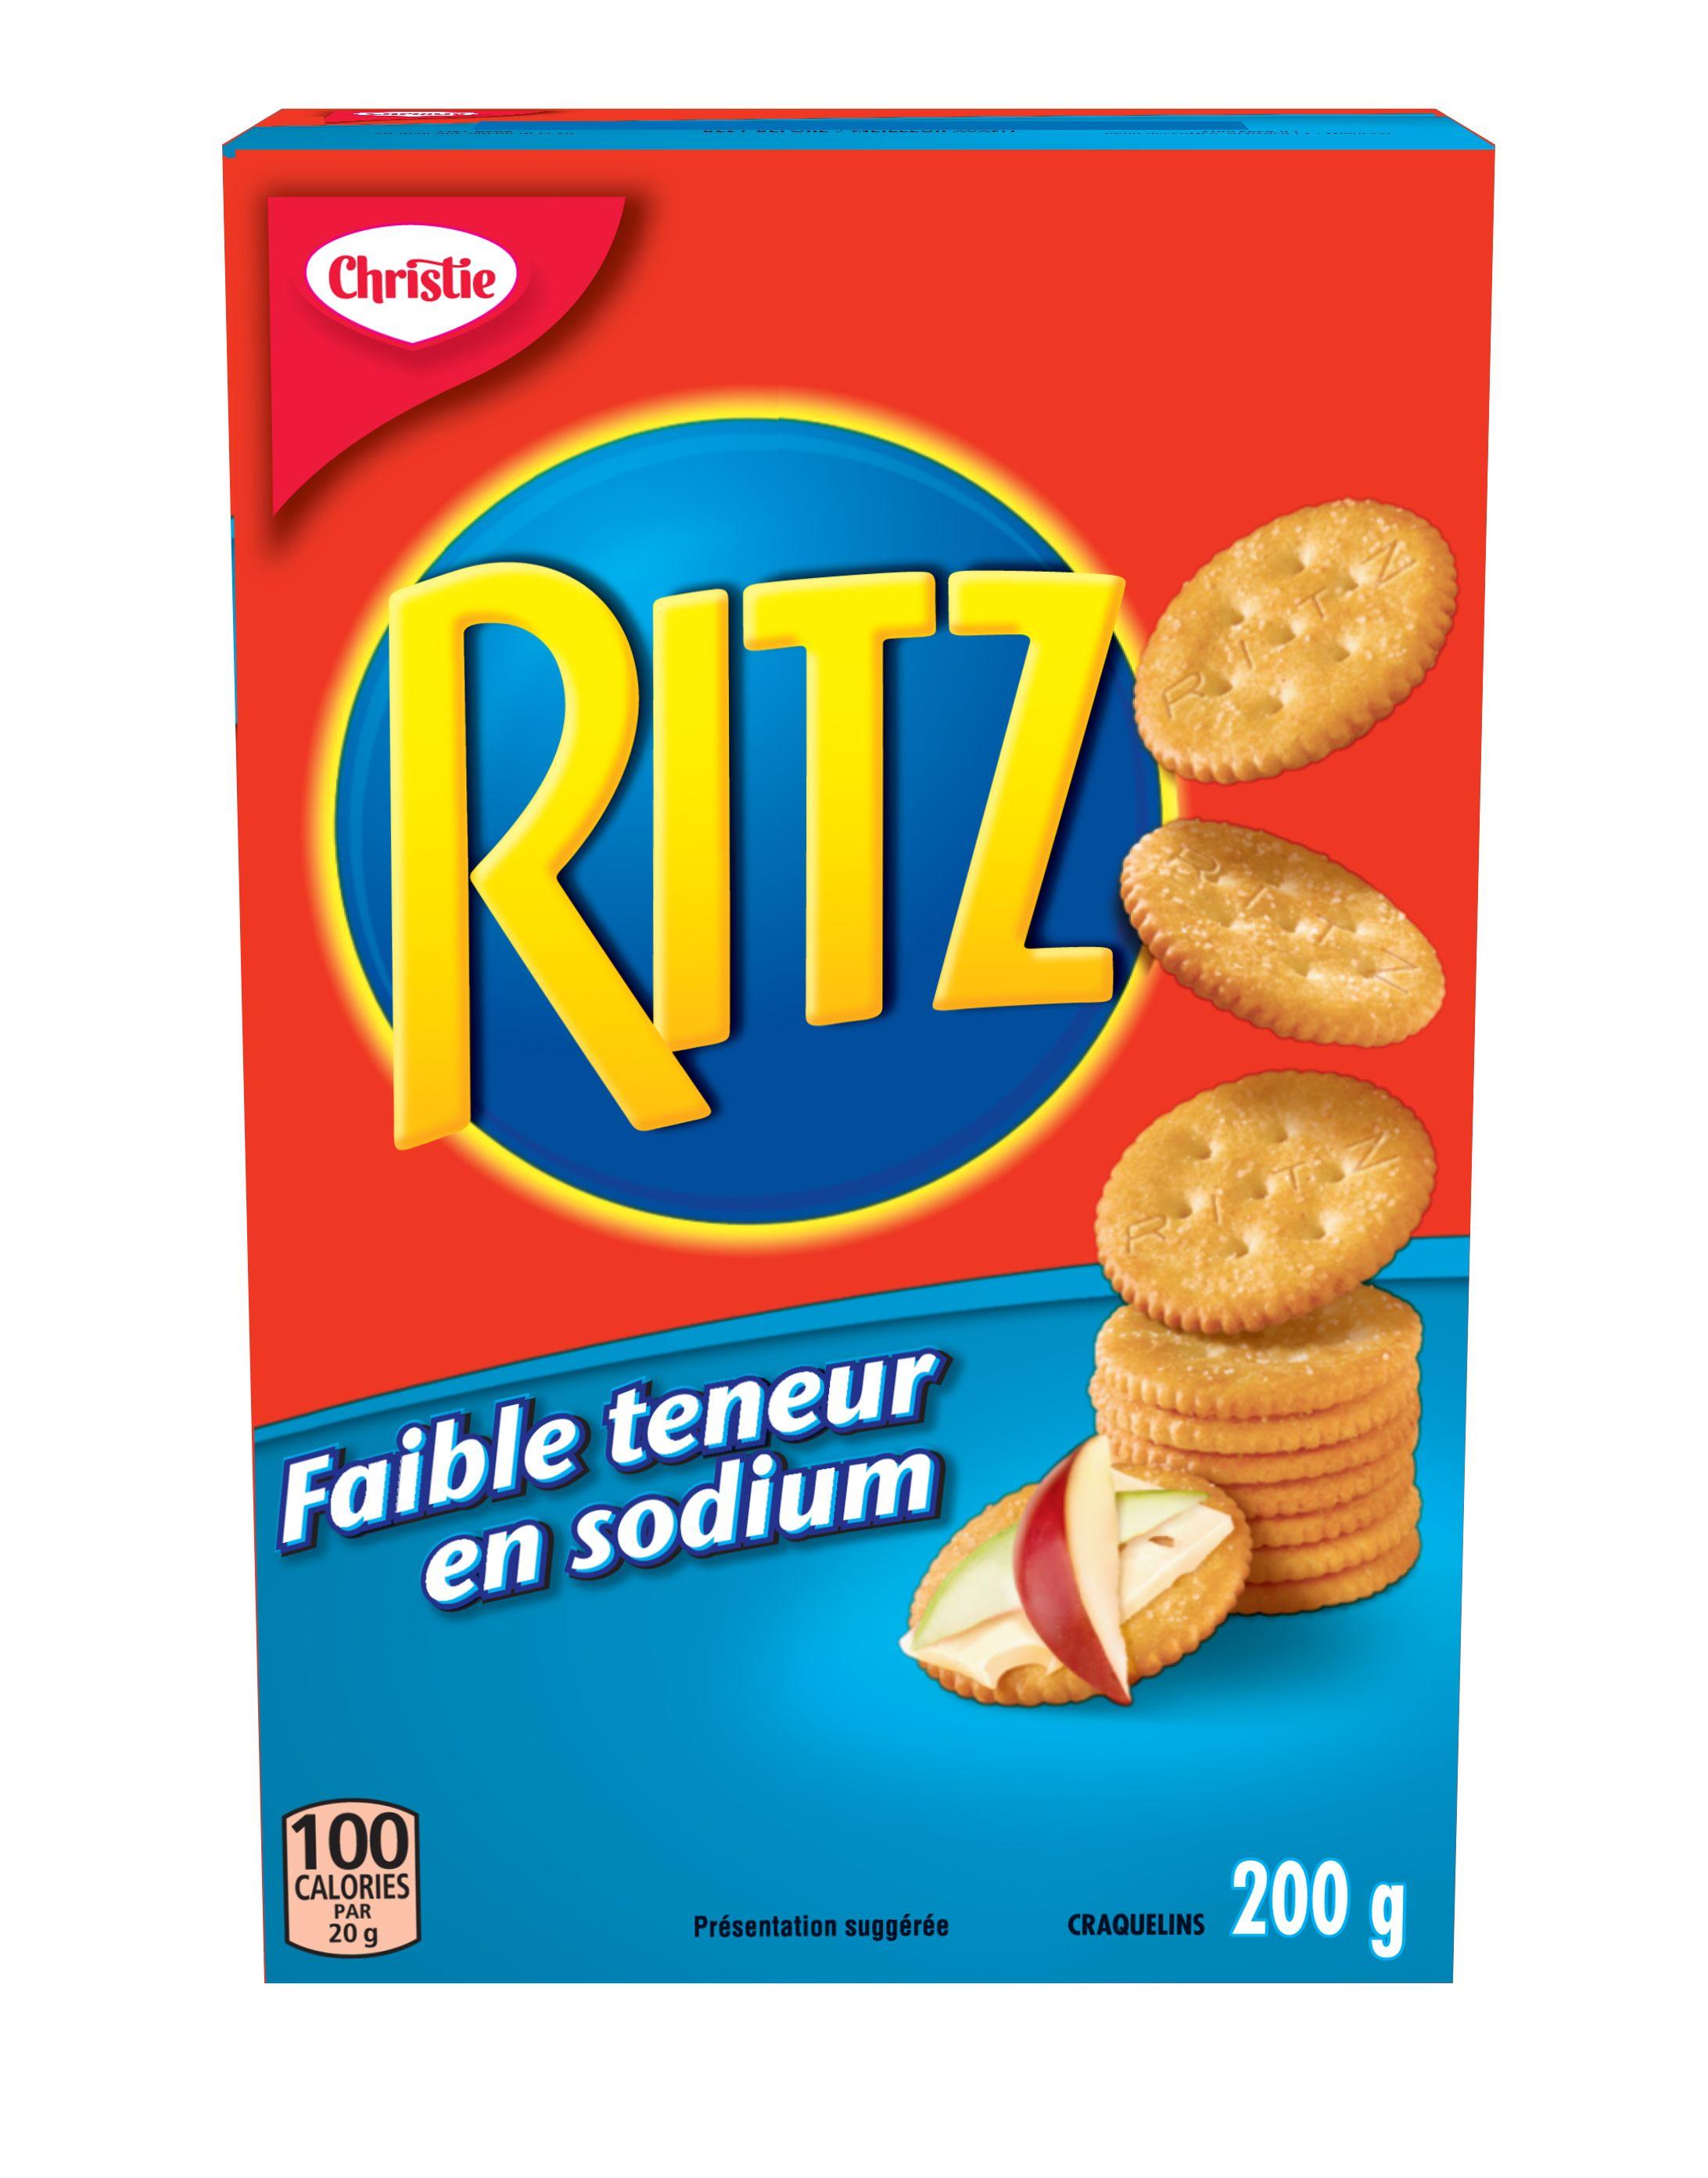 Craquelins Ritz Faible Teneur En Sodium 200 G